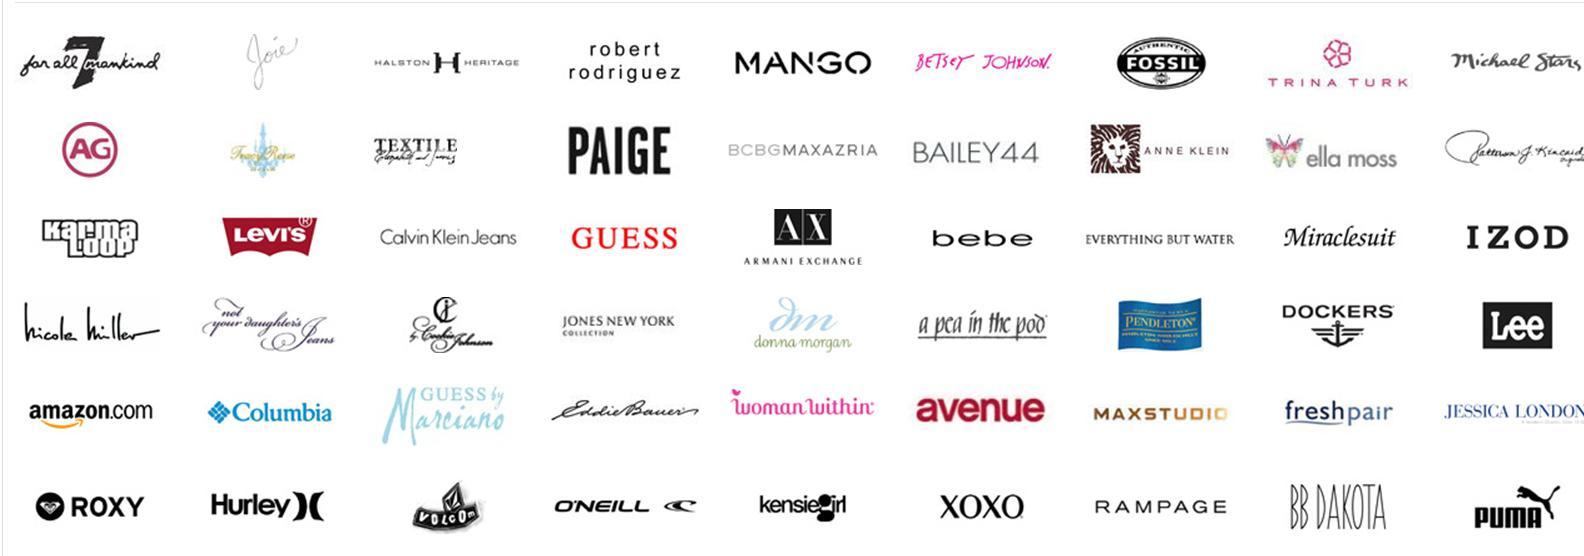 Screenshot showing logos of different brands